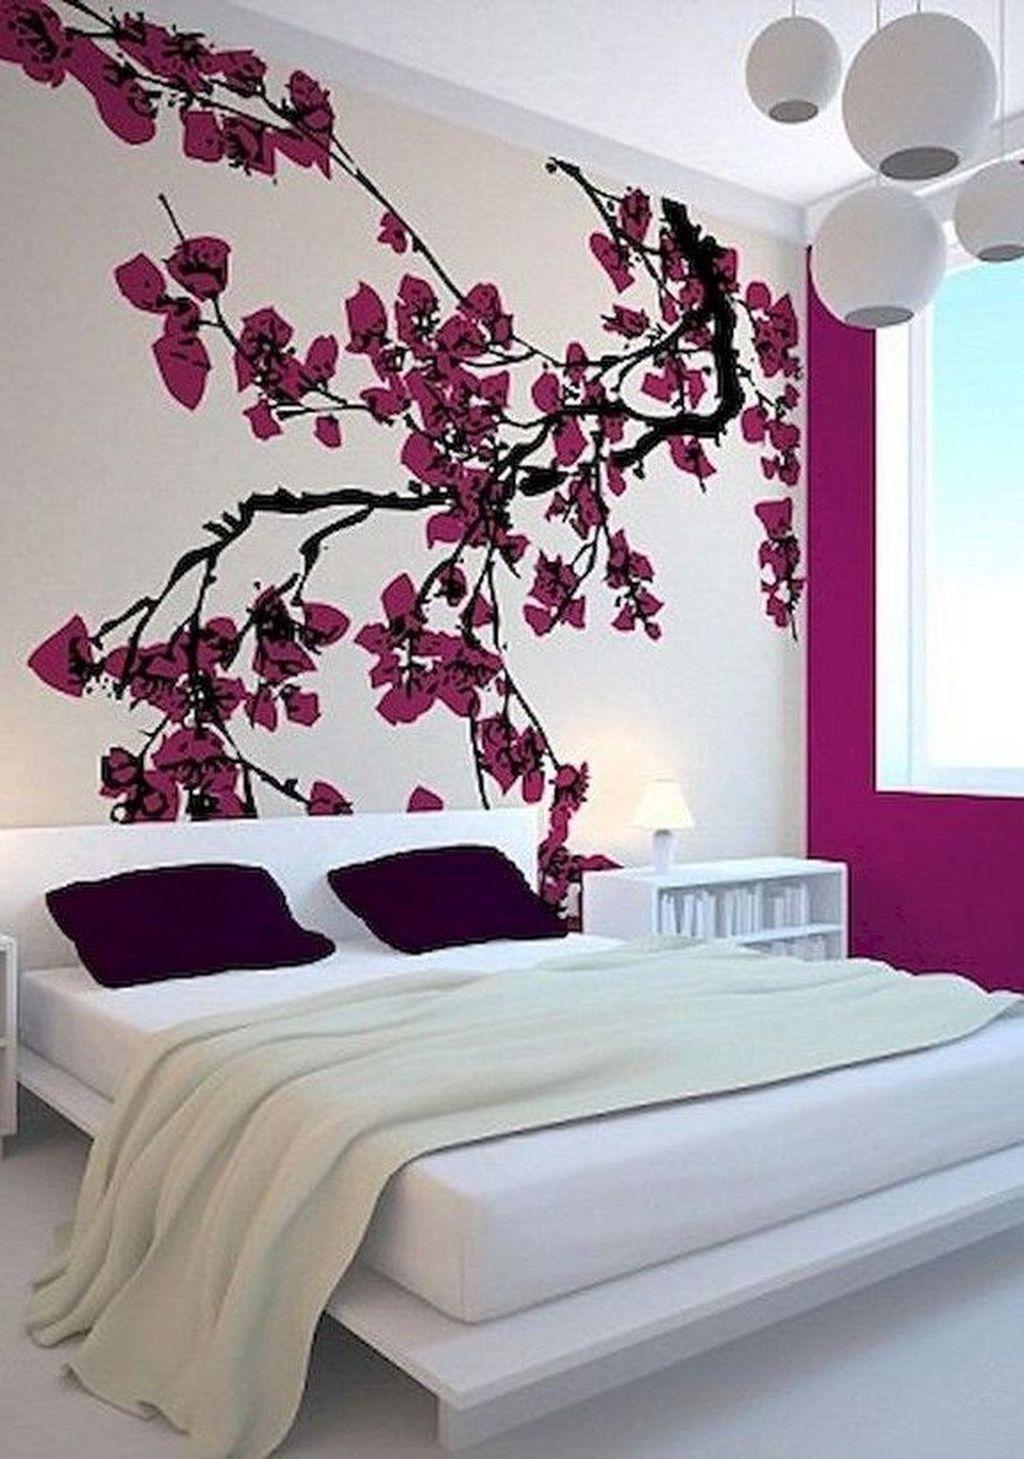 37 Relaxing Bedroom Wallpaper Decoration Ideas For Comfortable Bedroom Wallpaper Bedroom Japanese Bedroom Decor Wallpaper Design For Bedroom